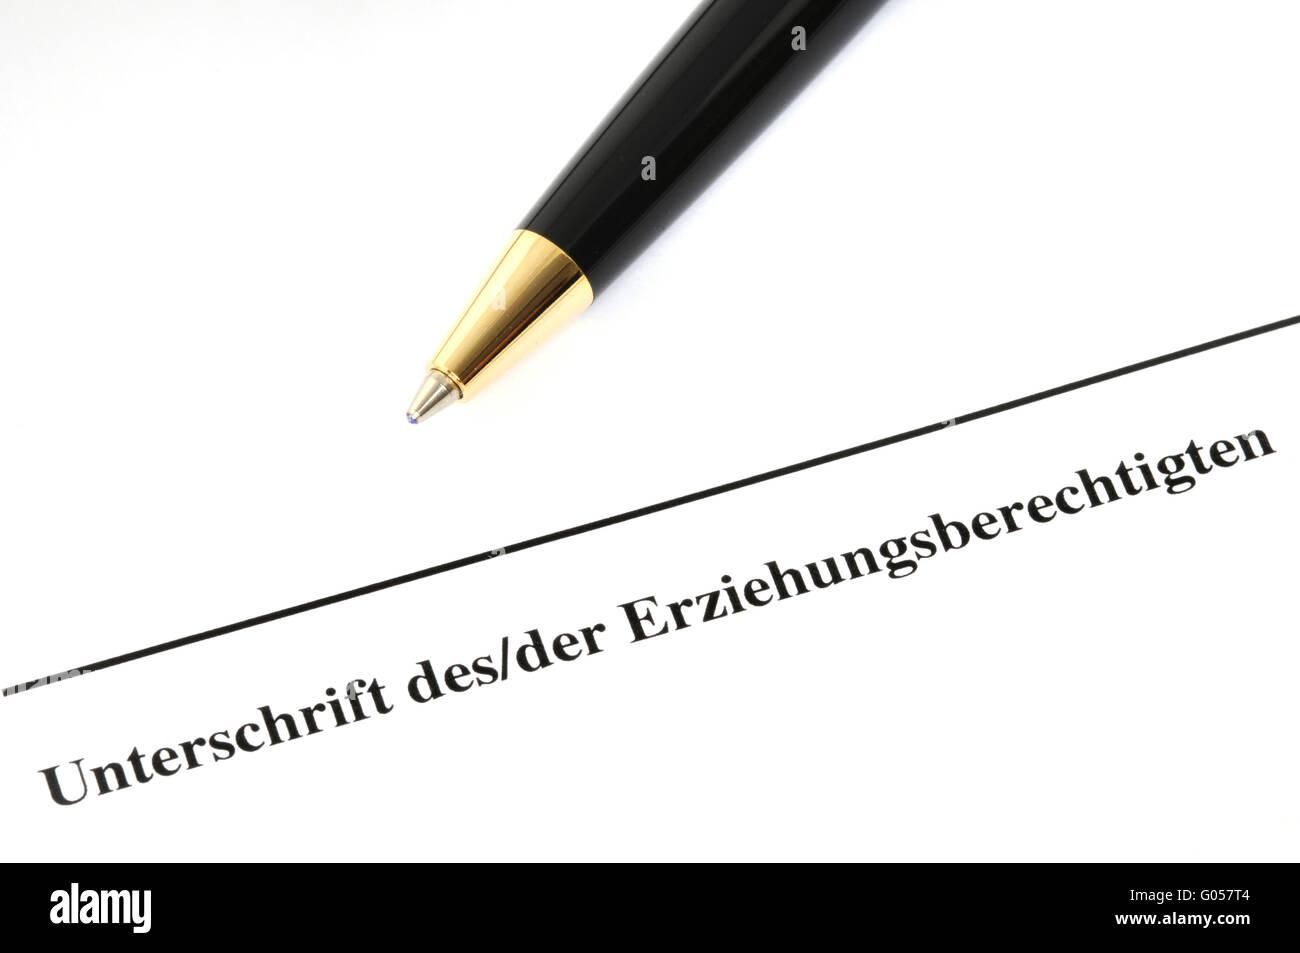 Unterschrift von Erziehungsberechtigten / Signature d'un gardien Banque D'Images